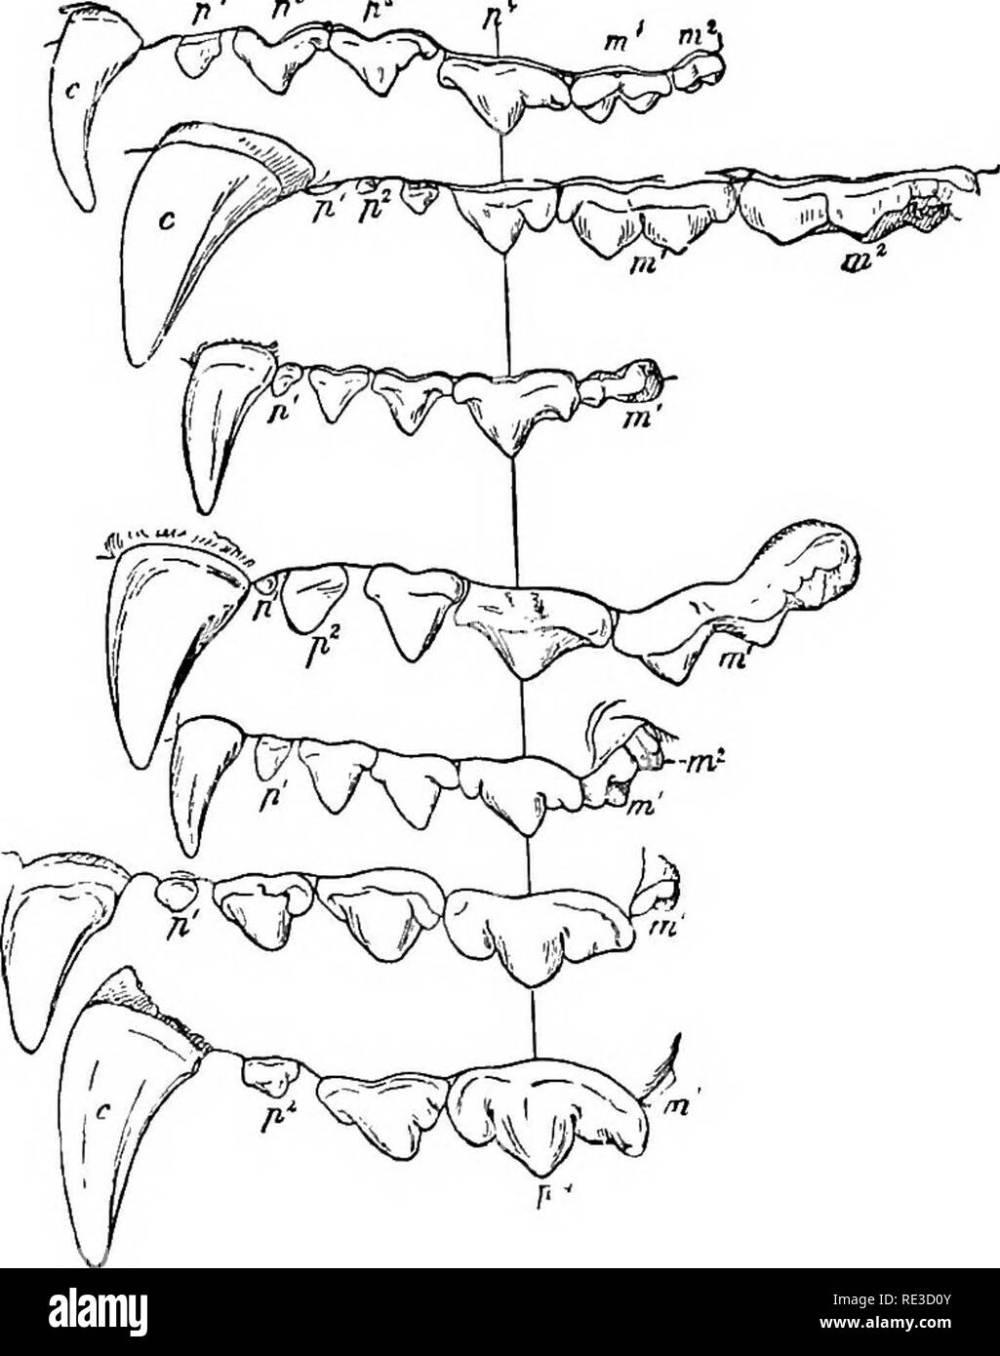 medium resolution of text book of zoology zoology 514 vert ehrata lor